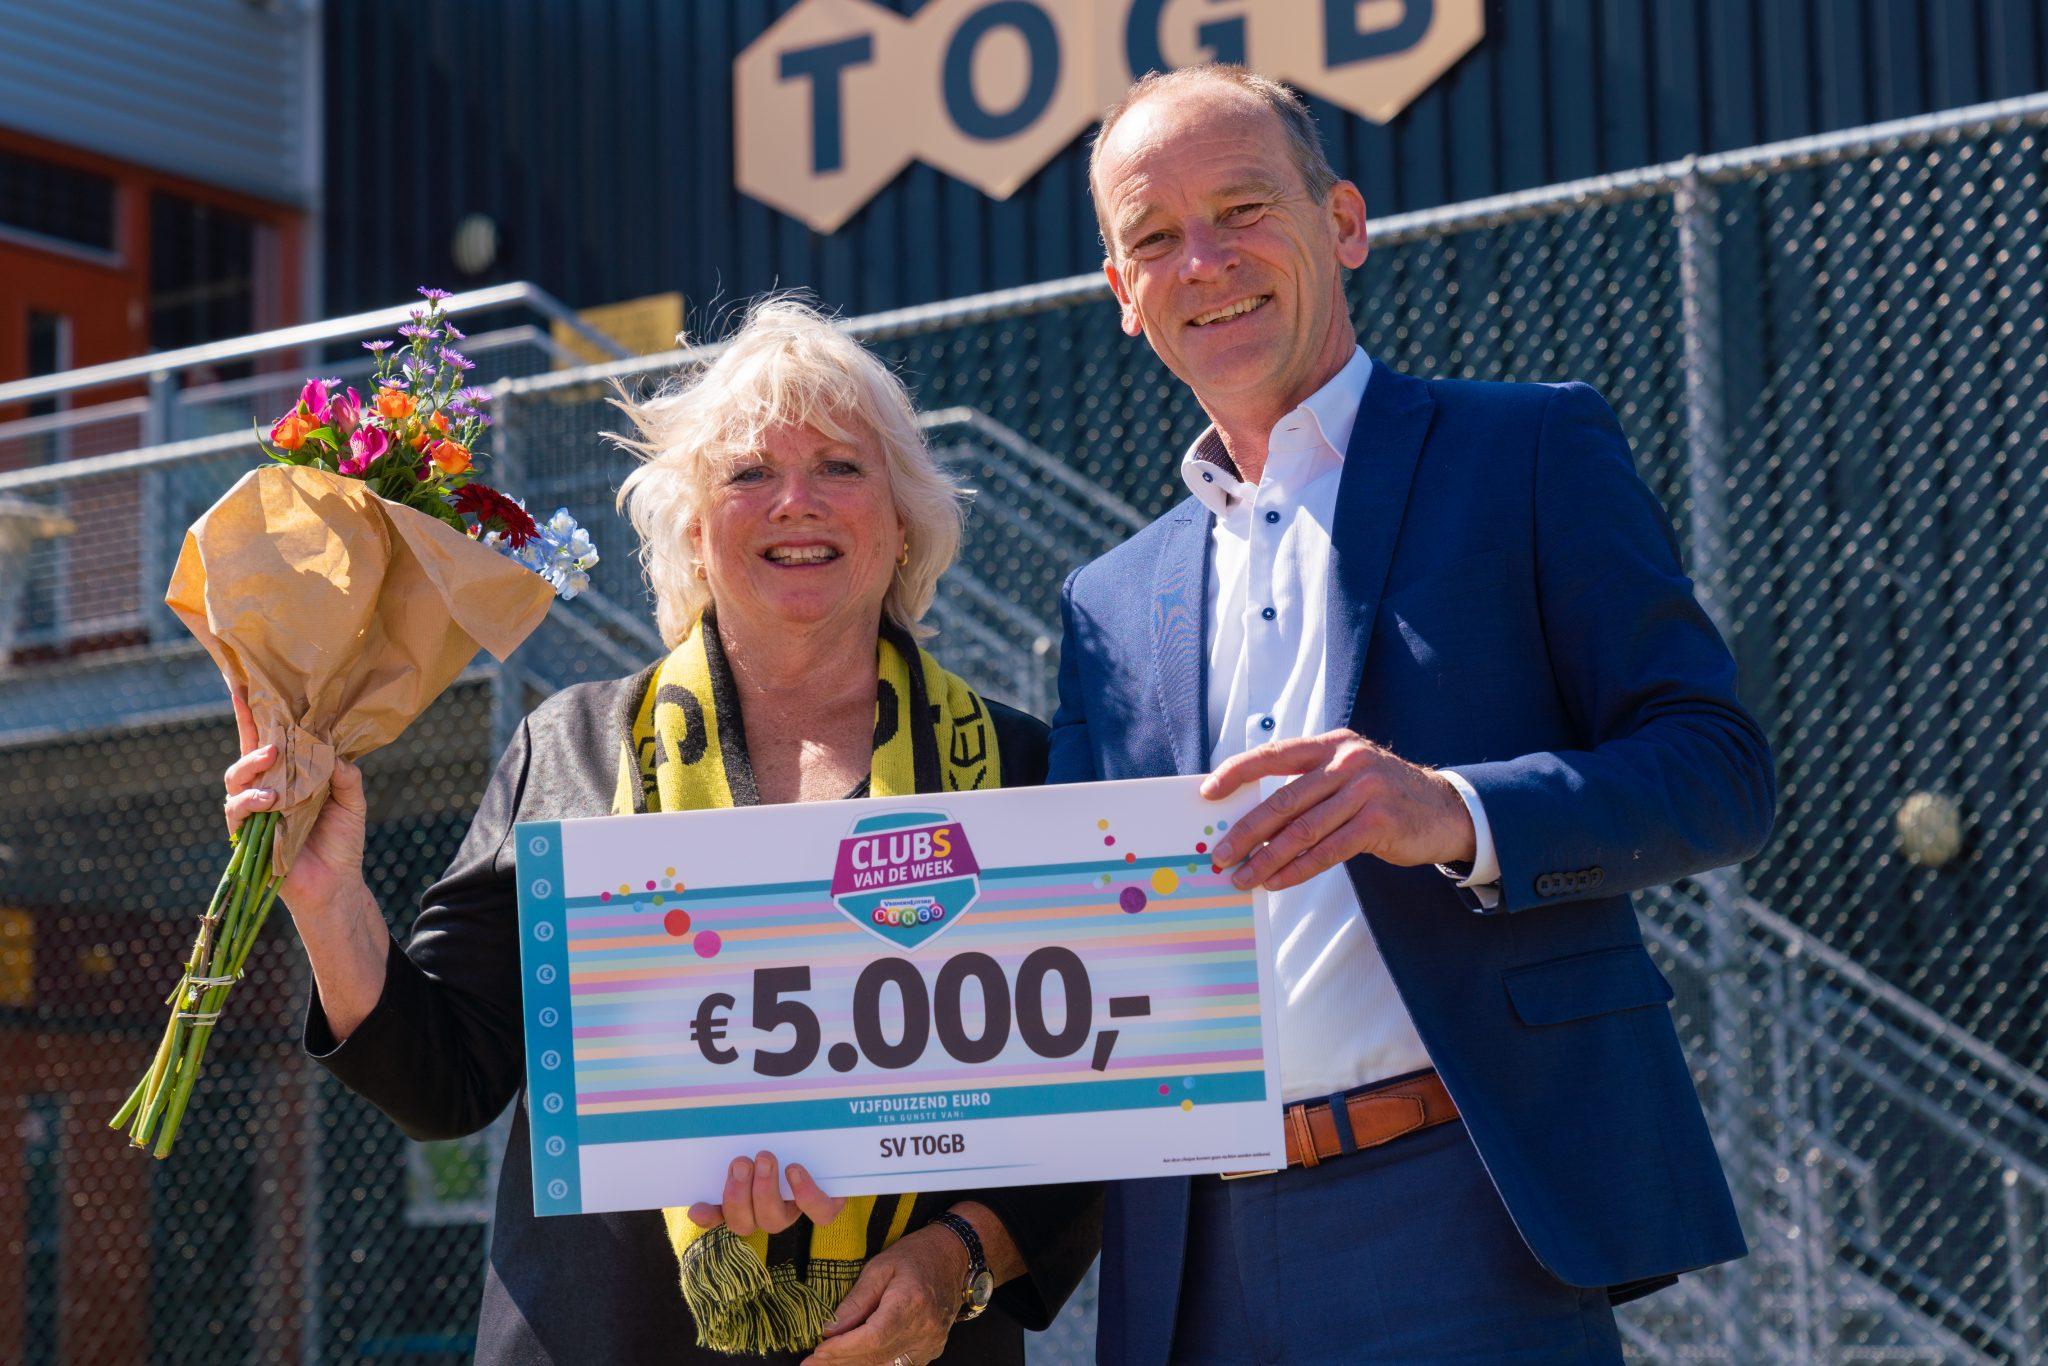 Vrienden Loterij steunt TOGB